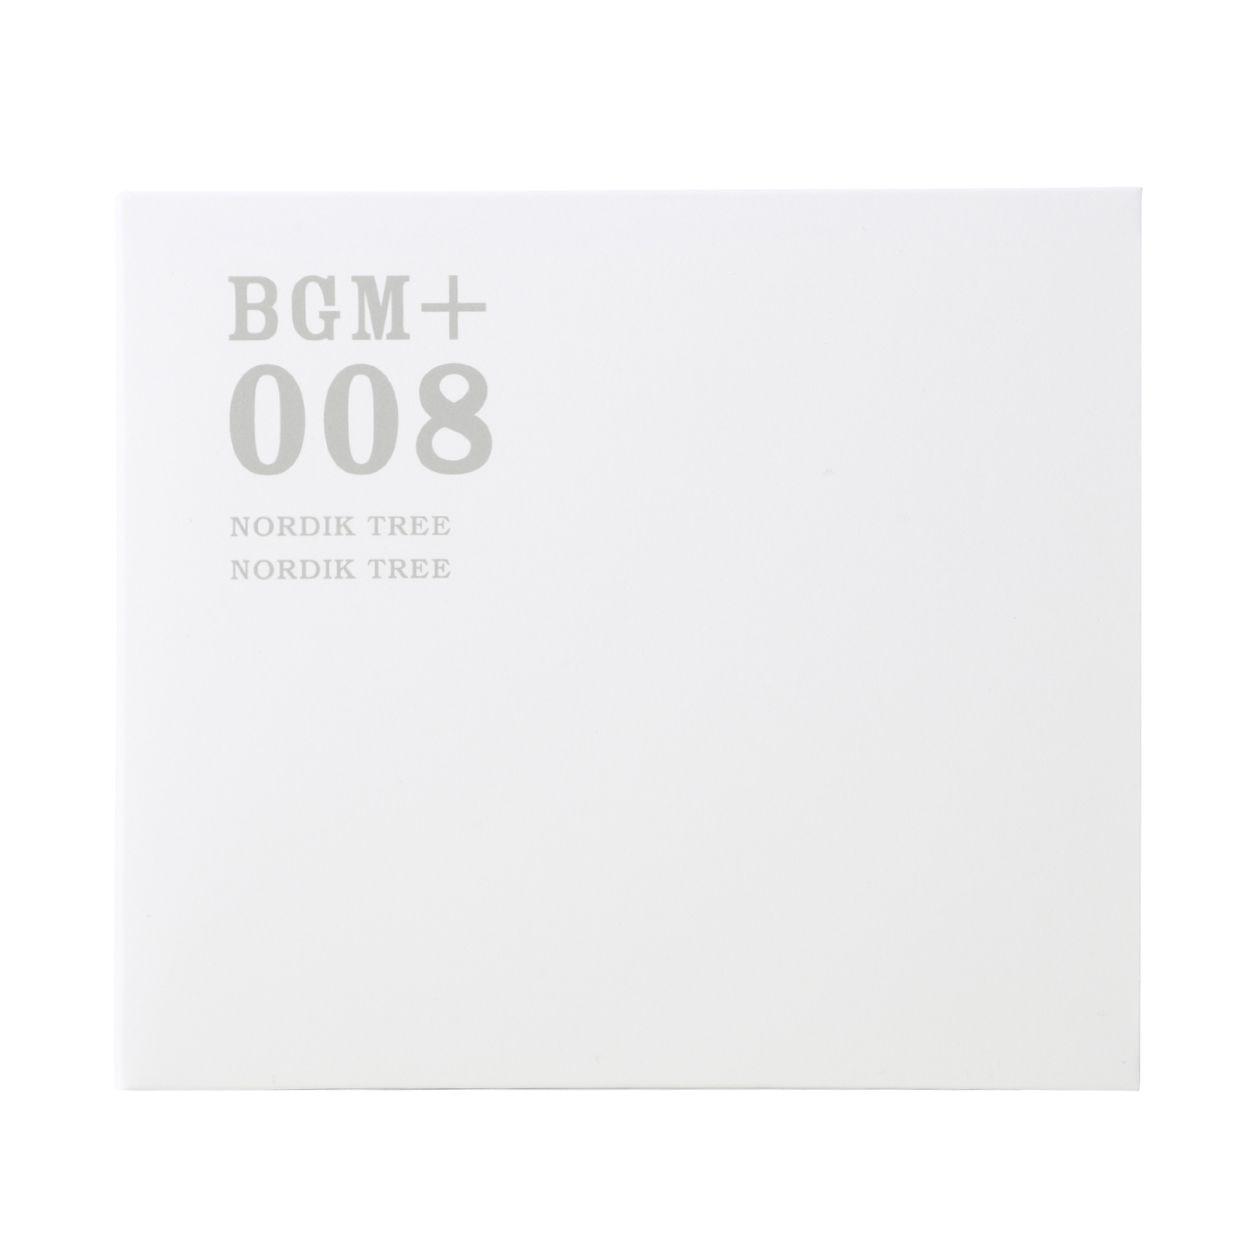 BGM+008